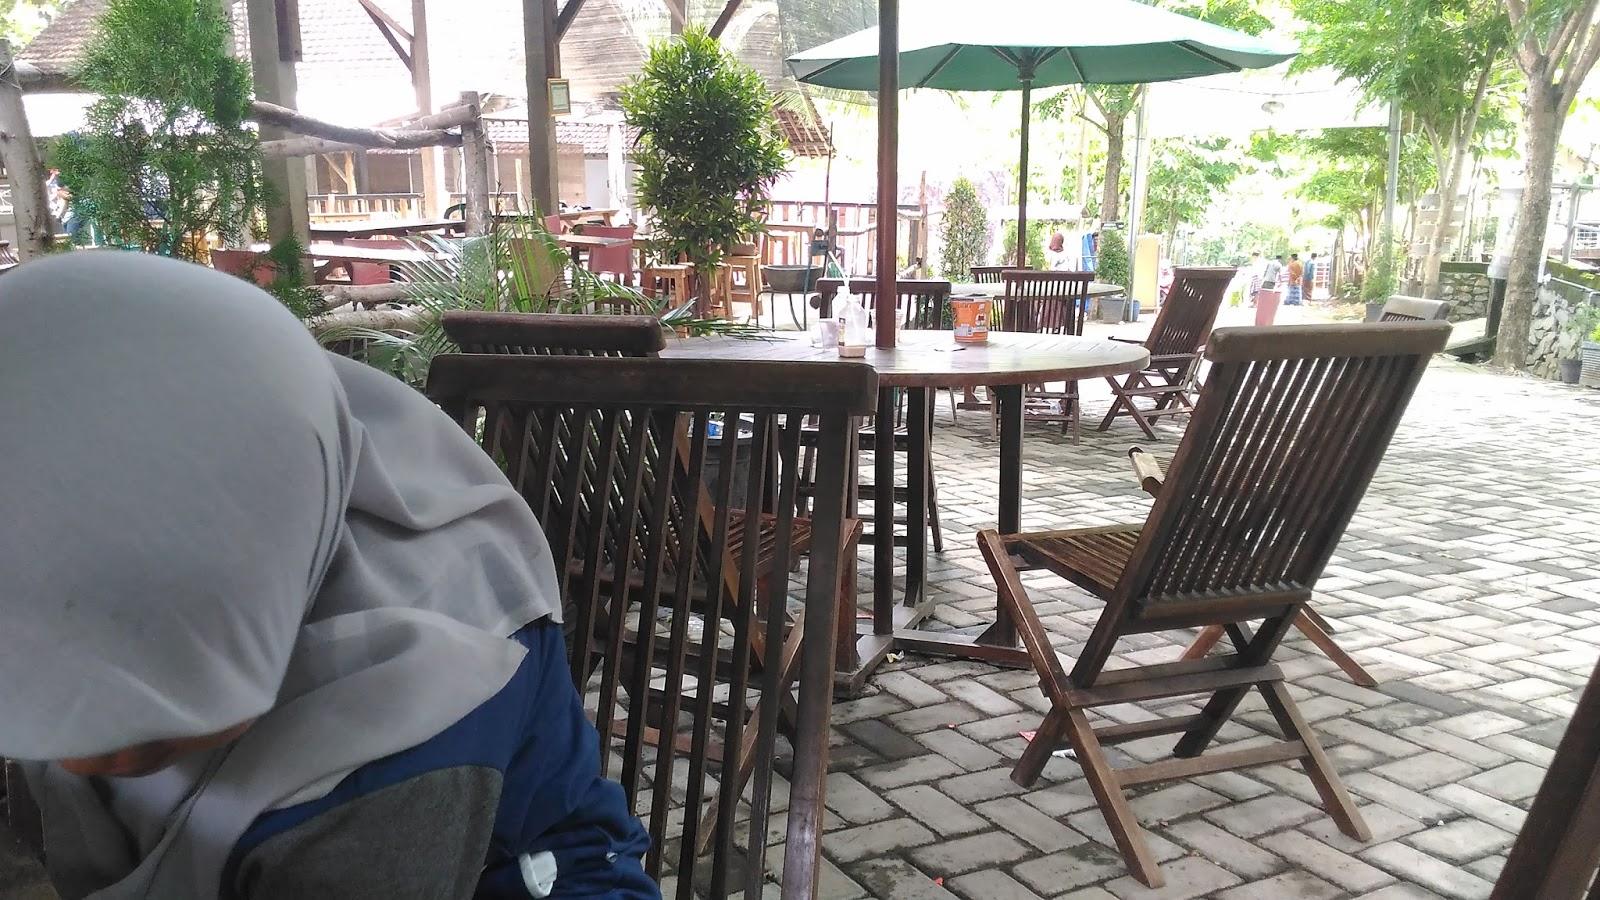 World Adventure Destination Kampung Susu Dinasty Lapar Disini Cafetarianya Kab